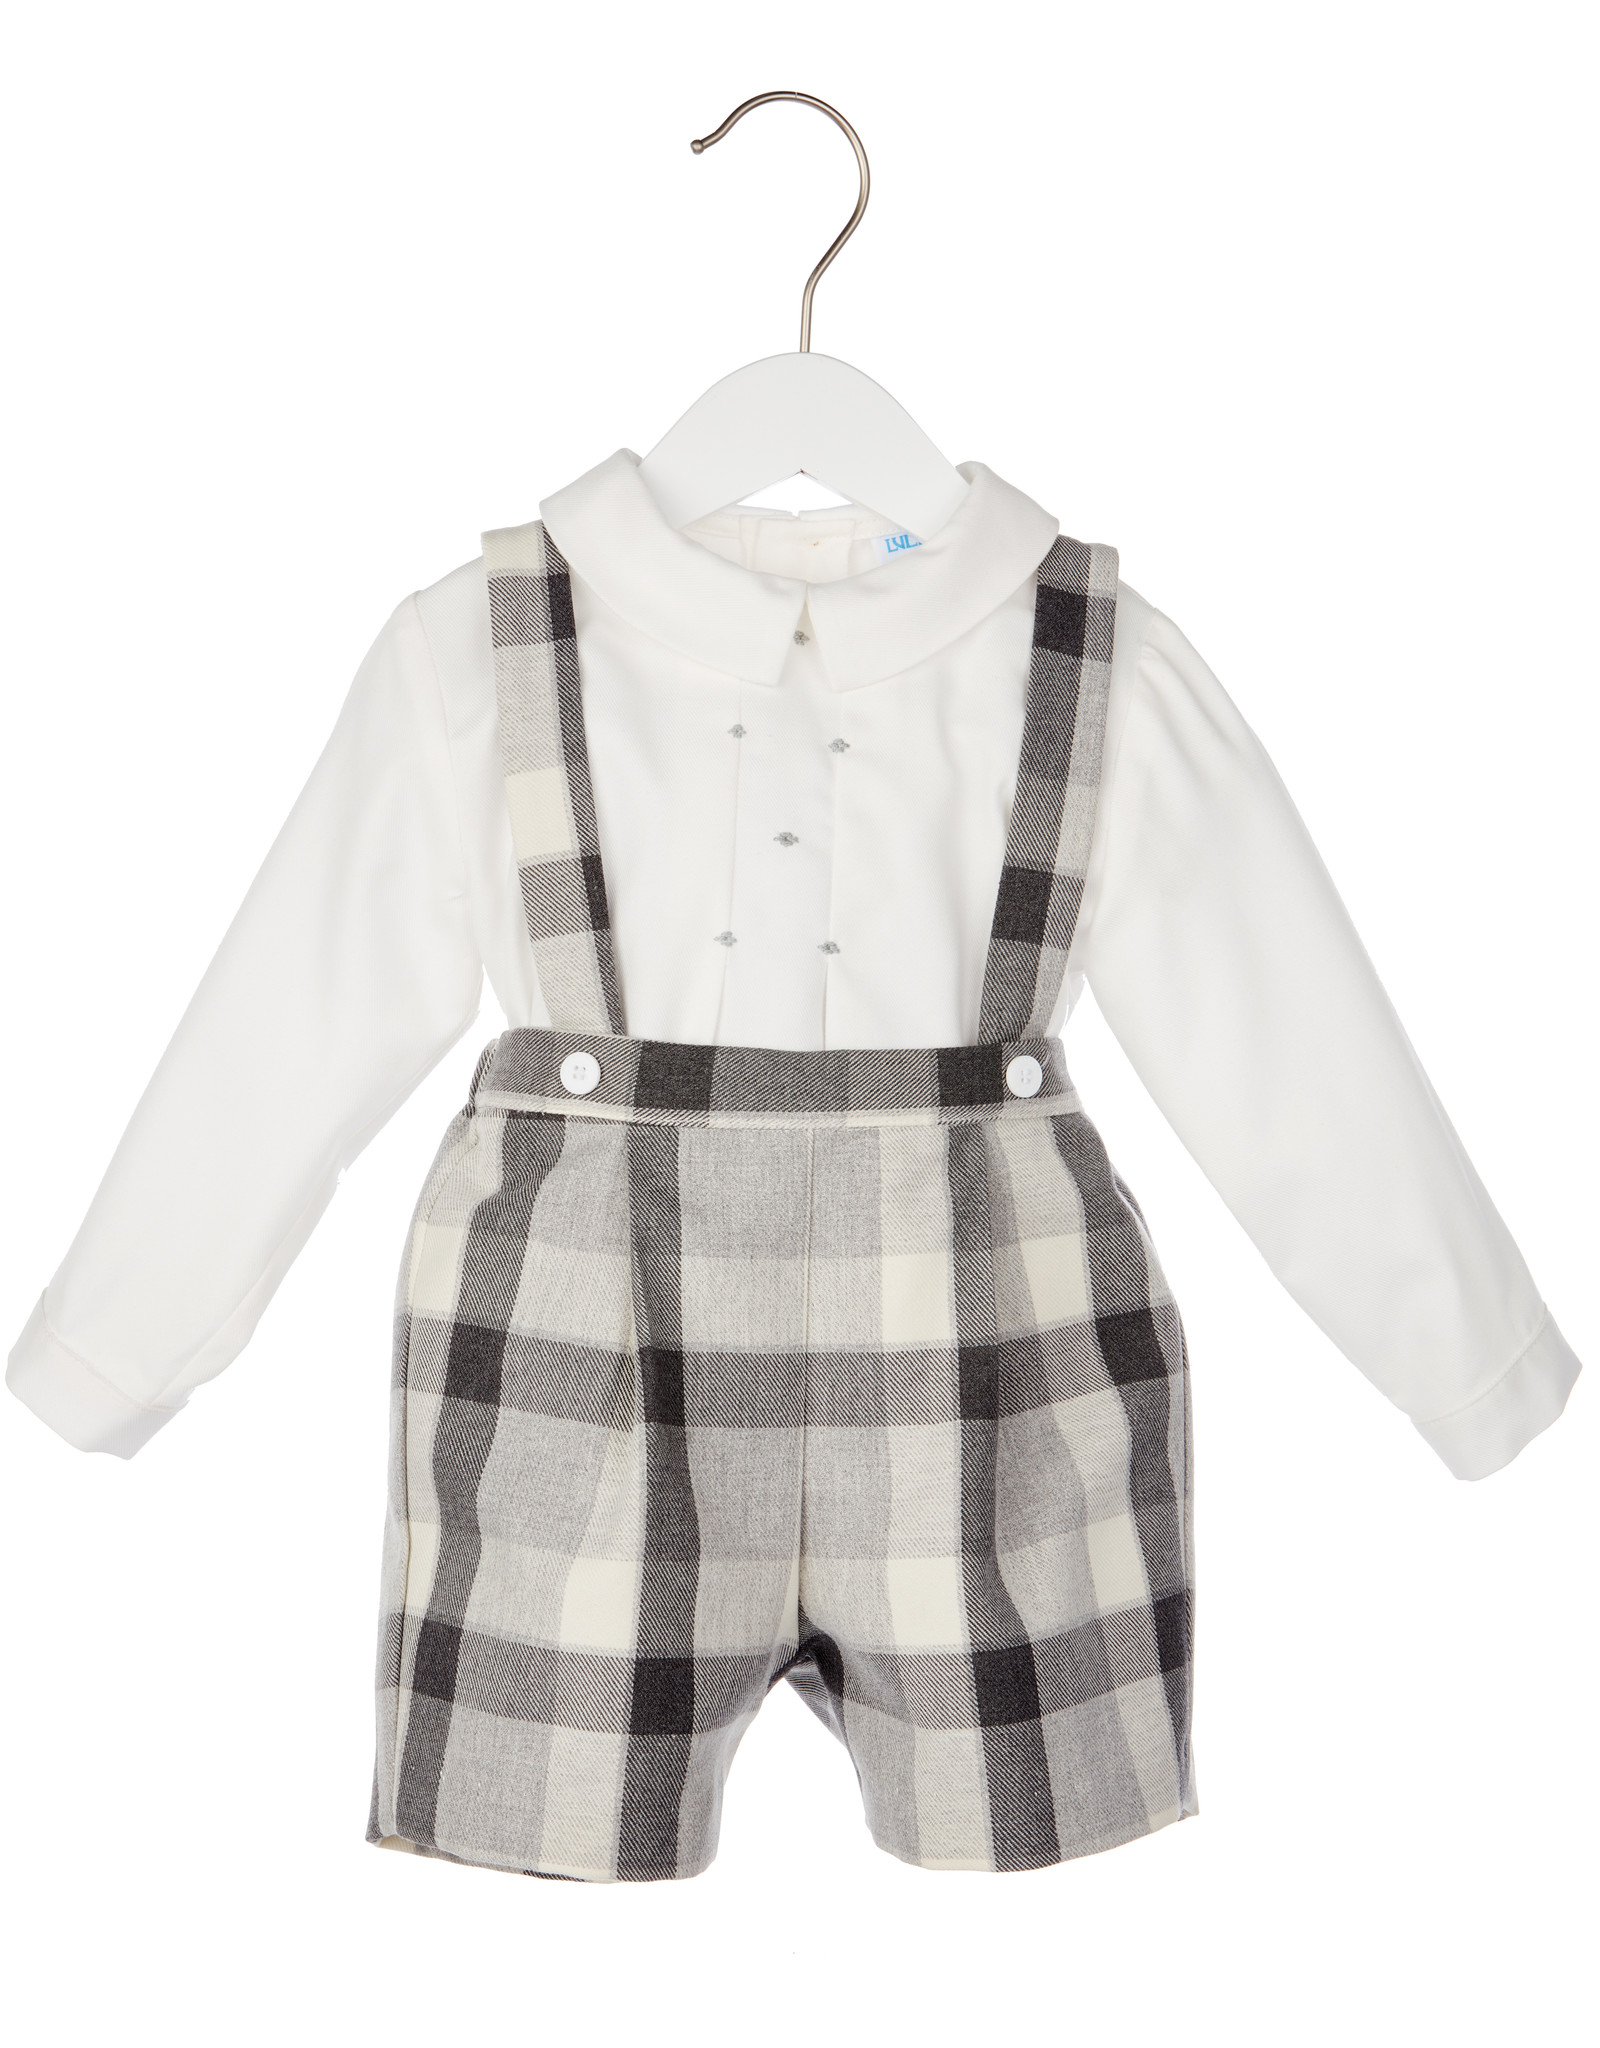 Luli Grey Plaid Suspender Short w/Smock Shirt